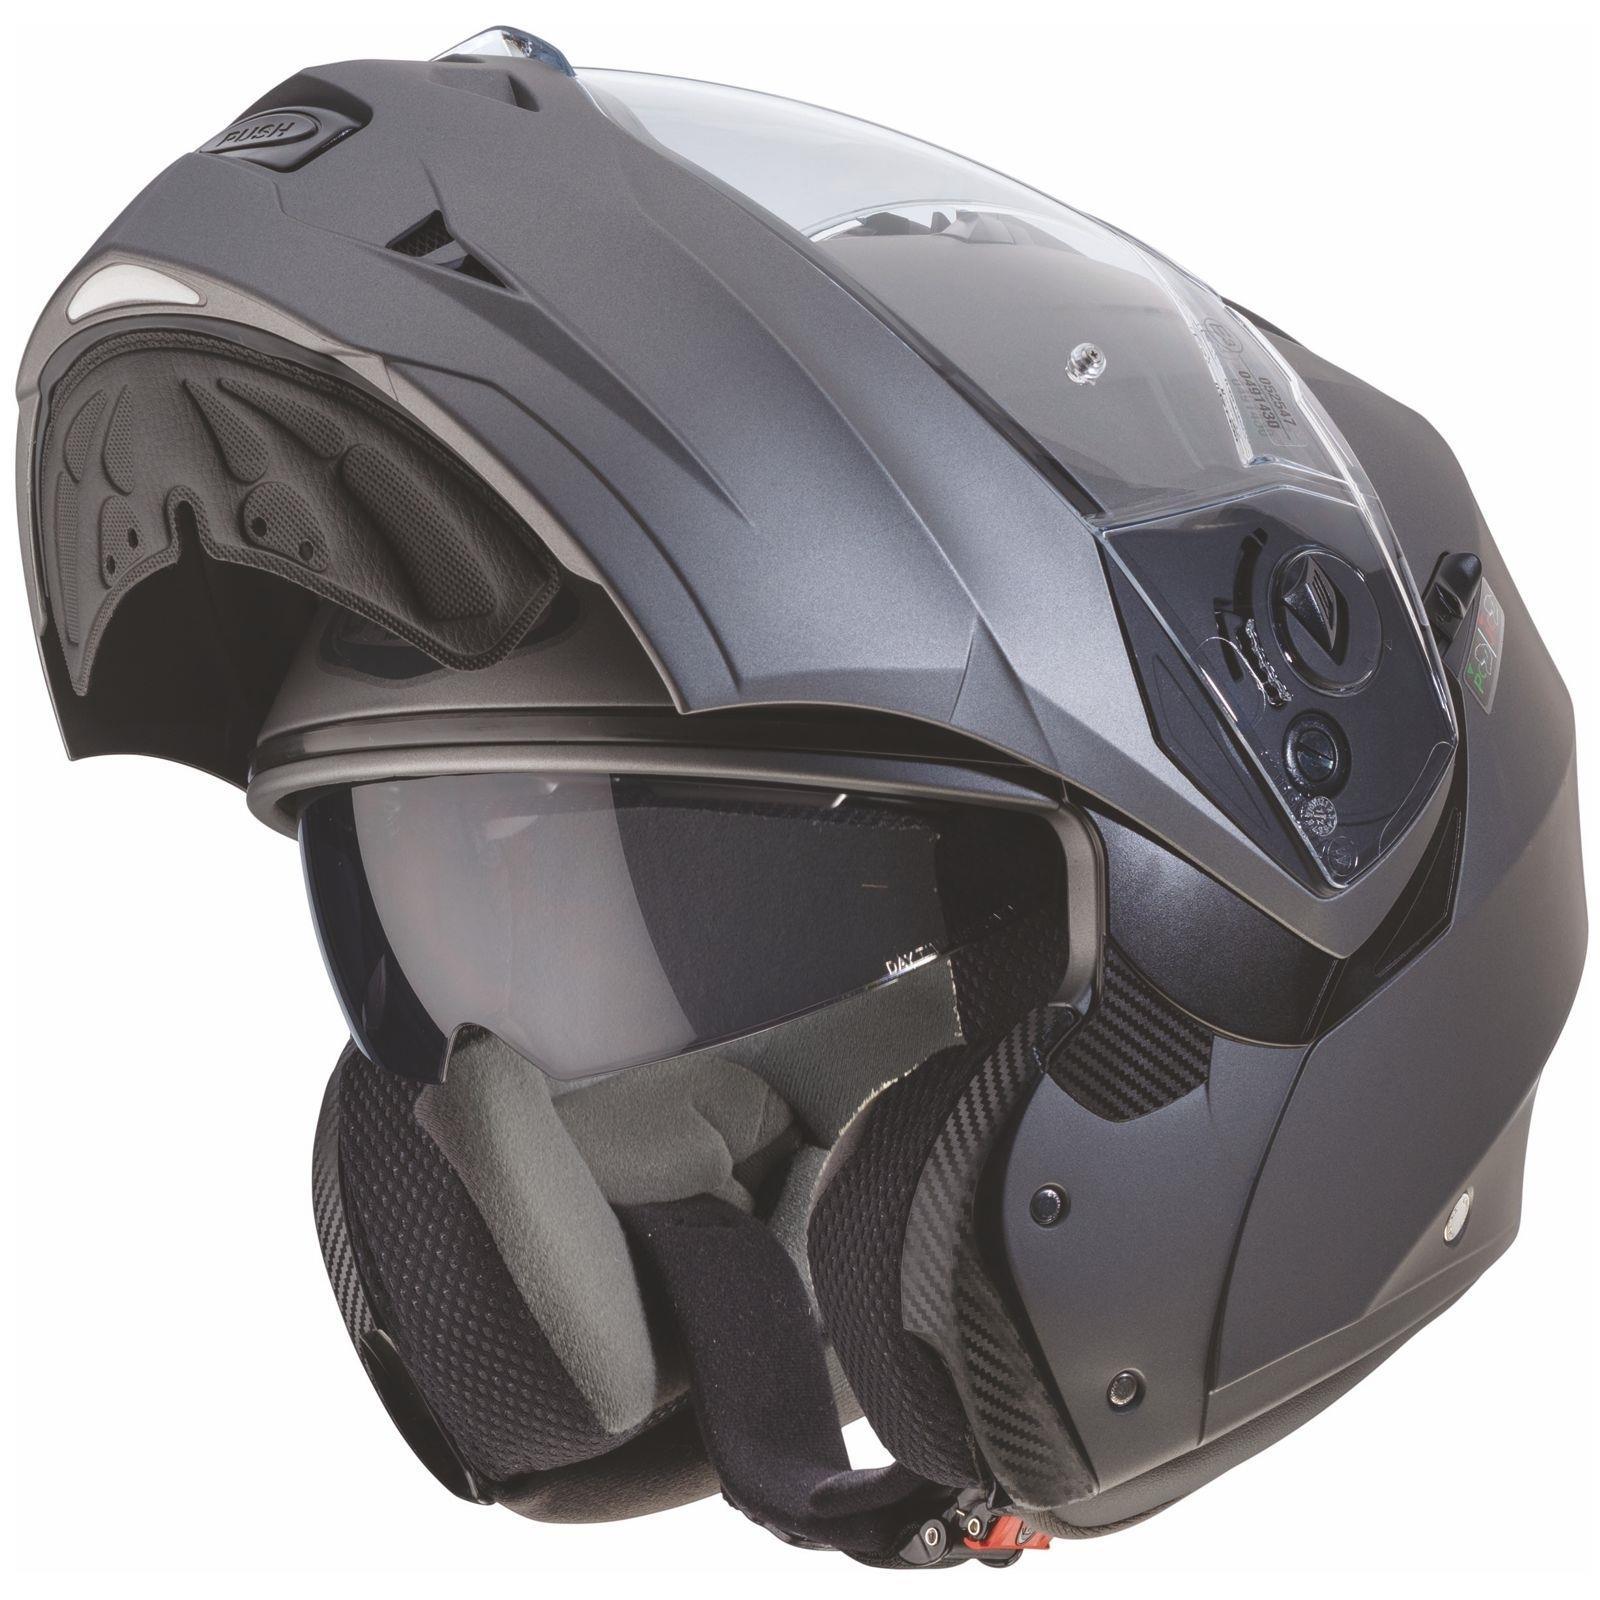 Caberg-Klapp-Helm-Duke-II-2-Motorrad-Belueftet-Sonnenblende-Pinlock-Visier-Jet Indexbild 18